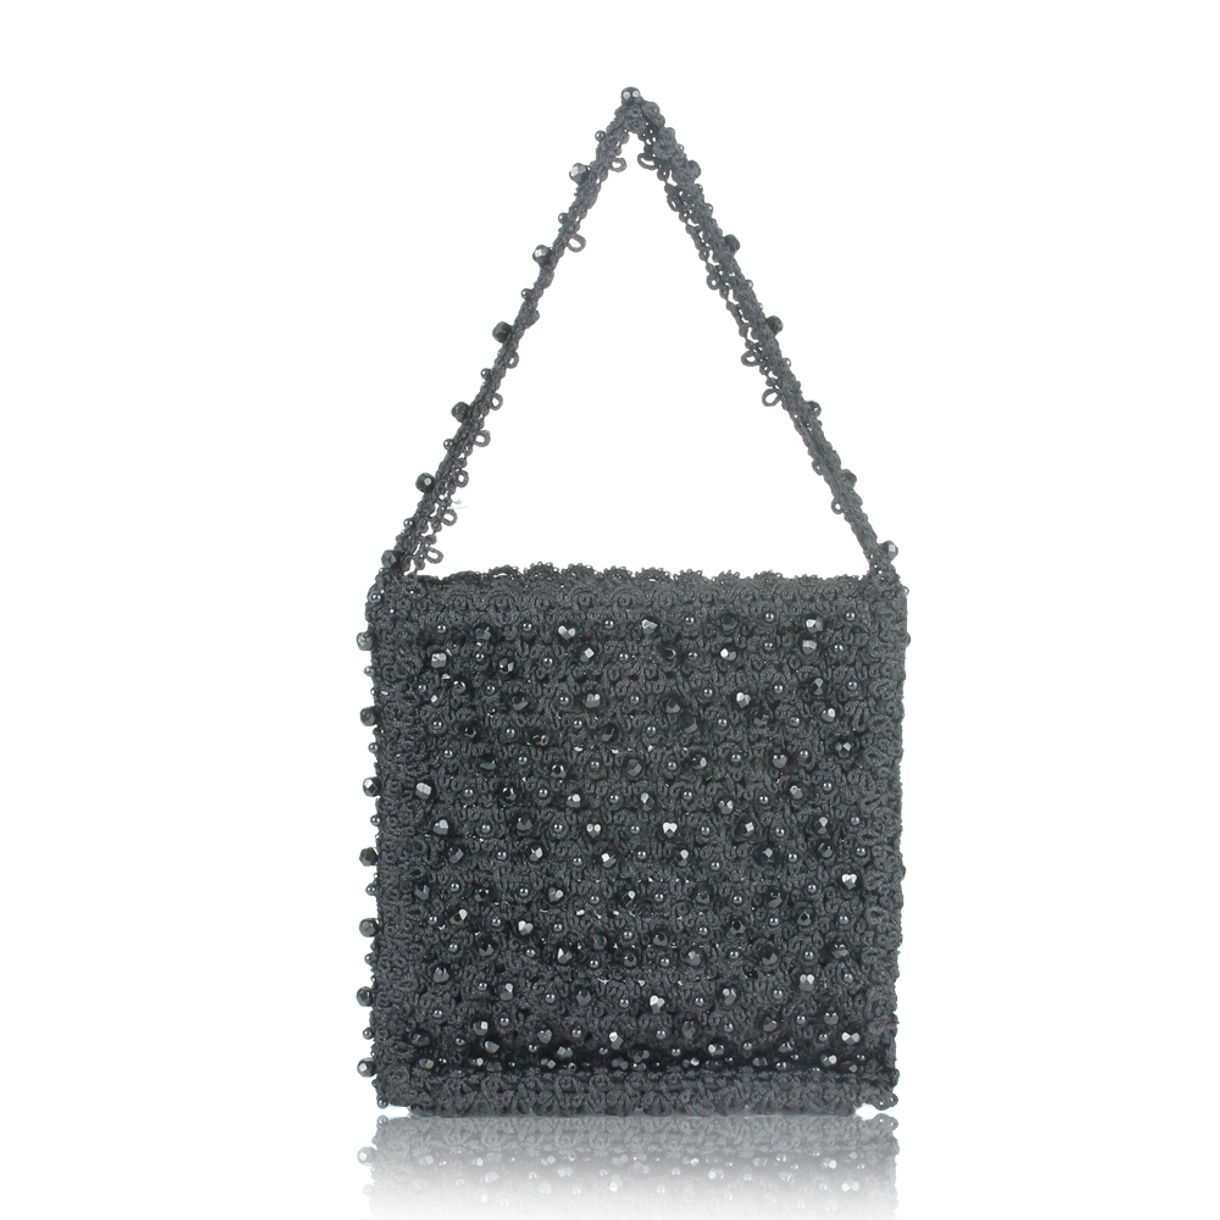 1852-mini-bolsa-croche-e-bordado-preta-1